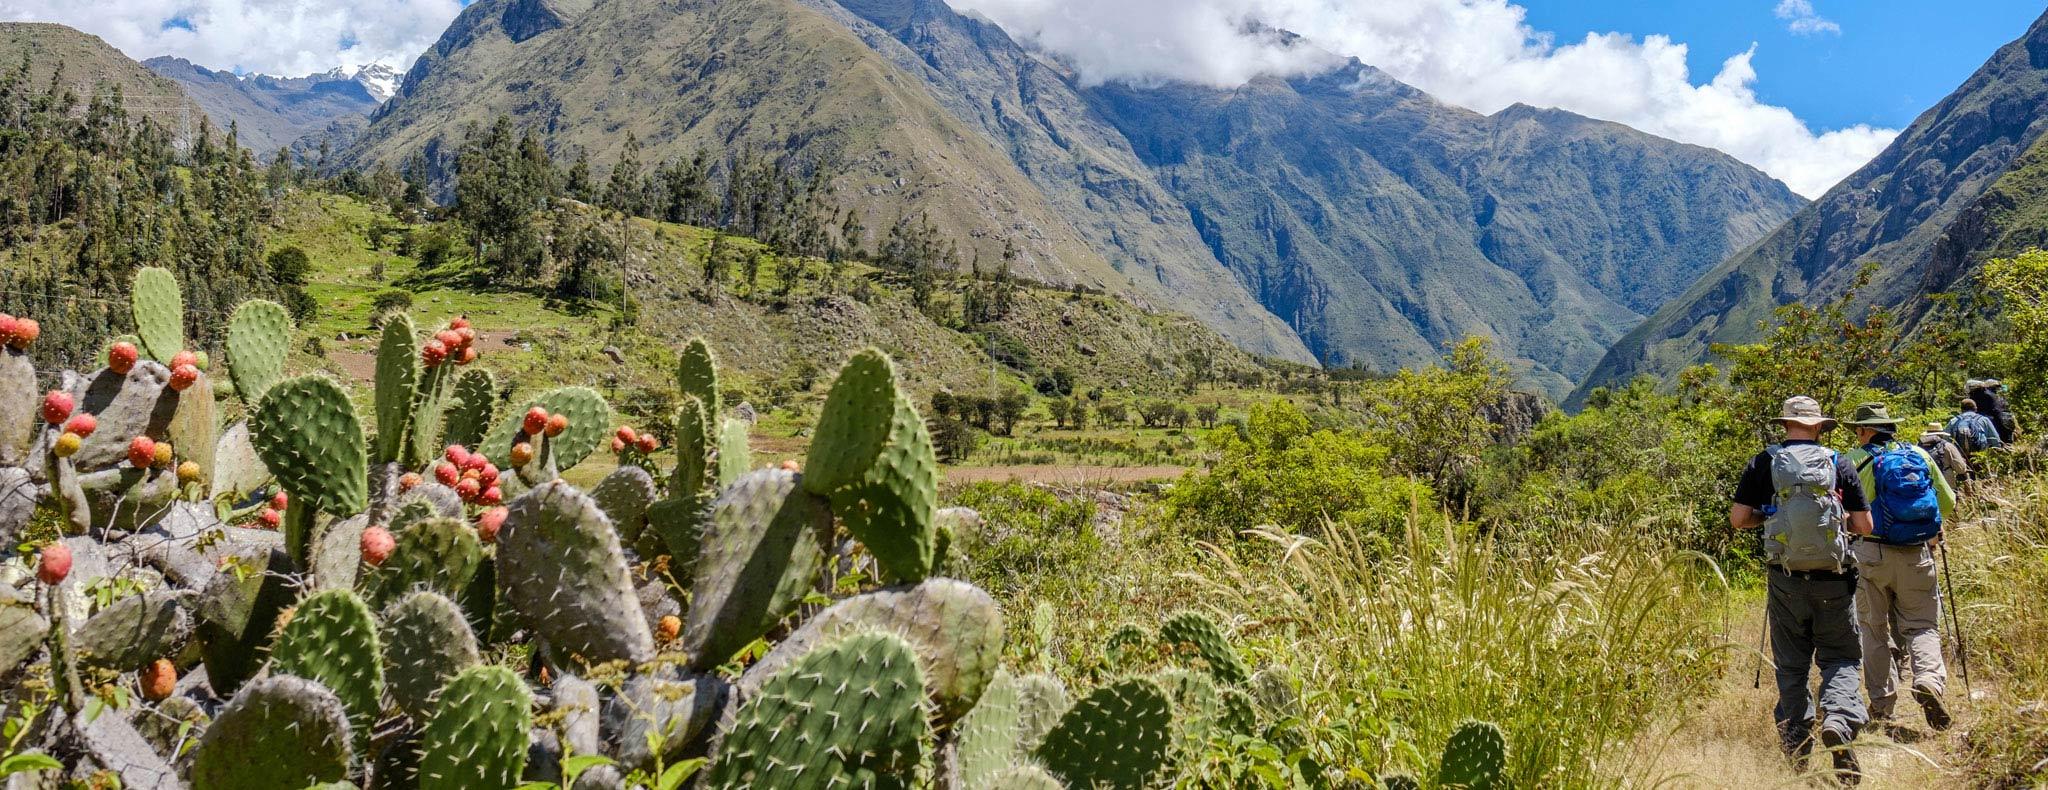 camino del inca alausi ecuador